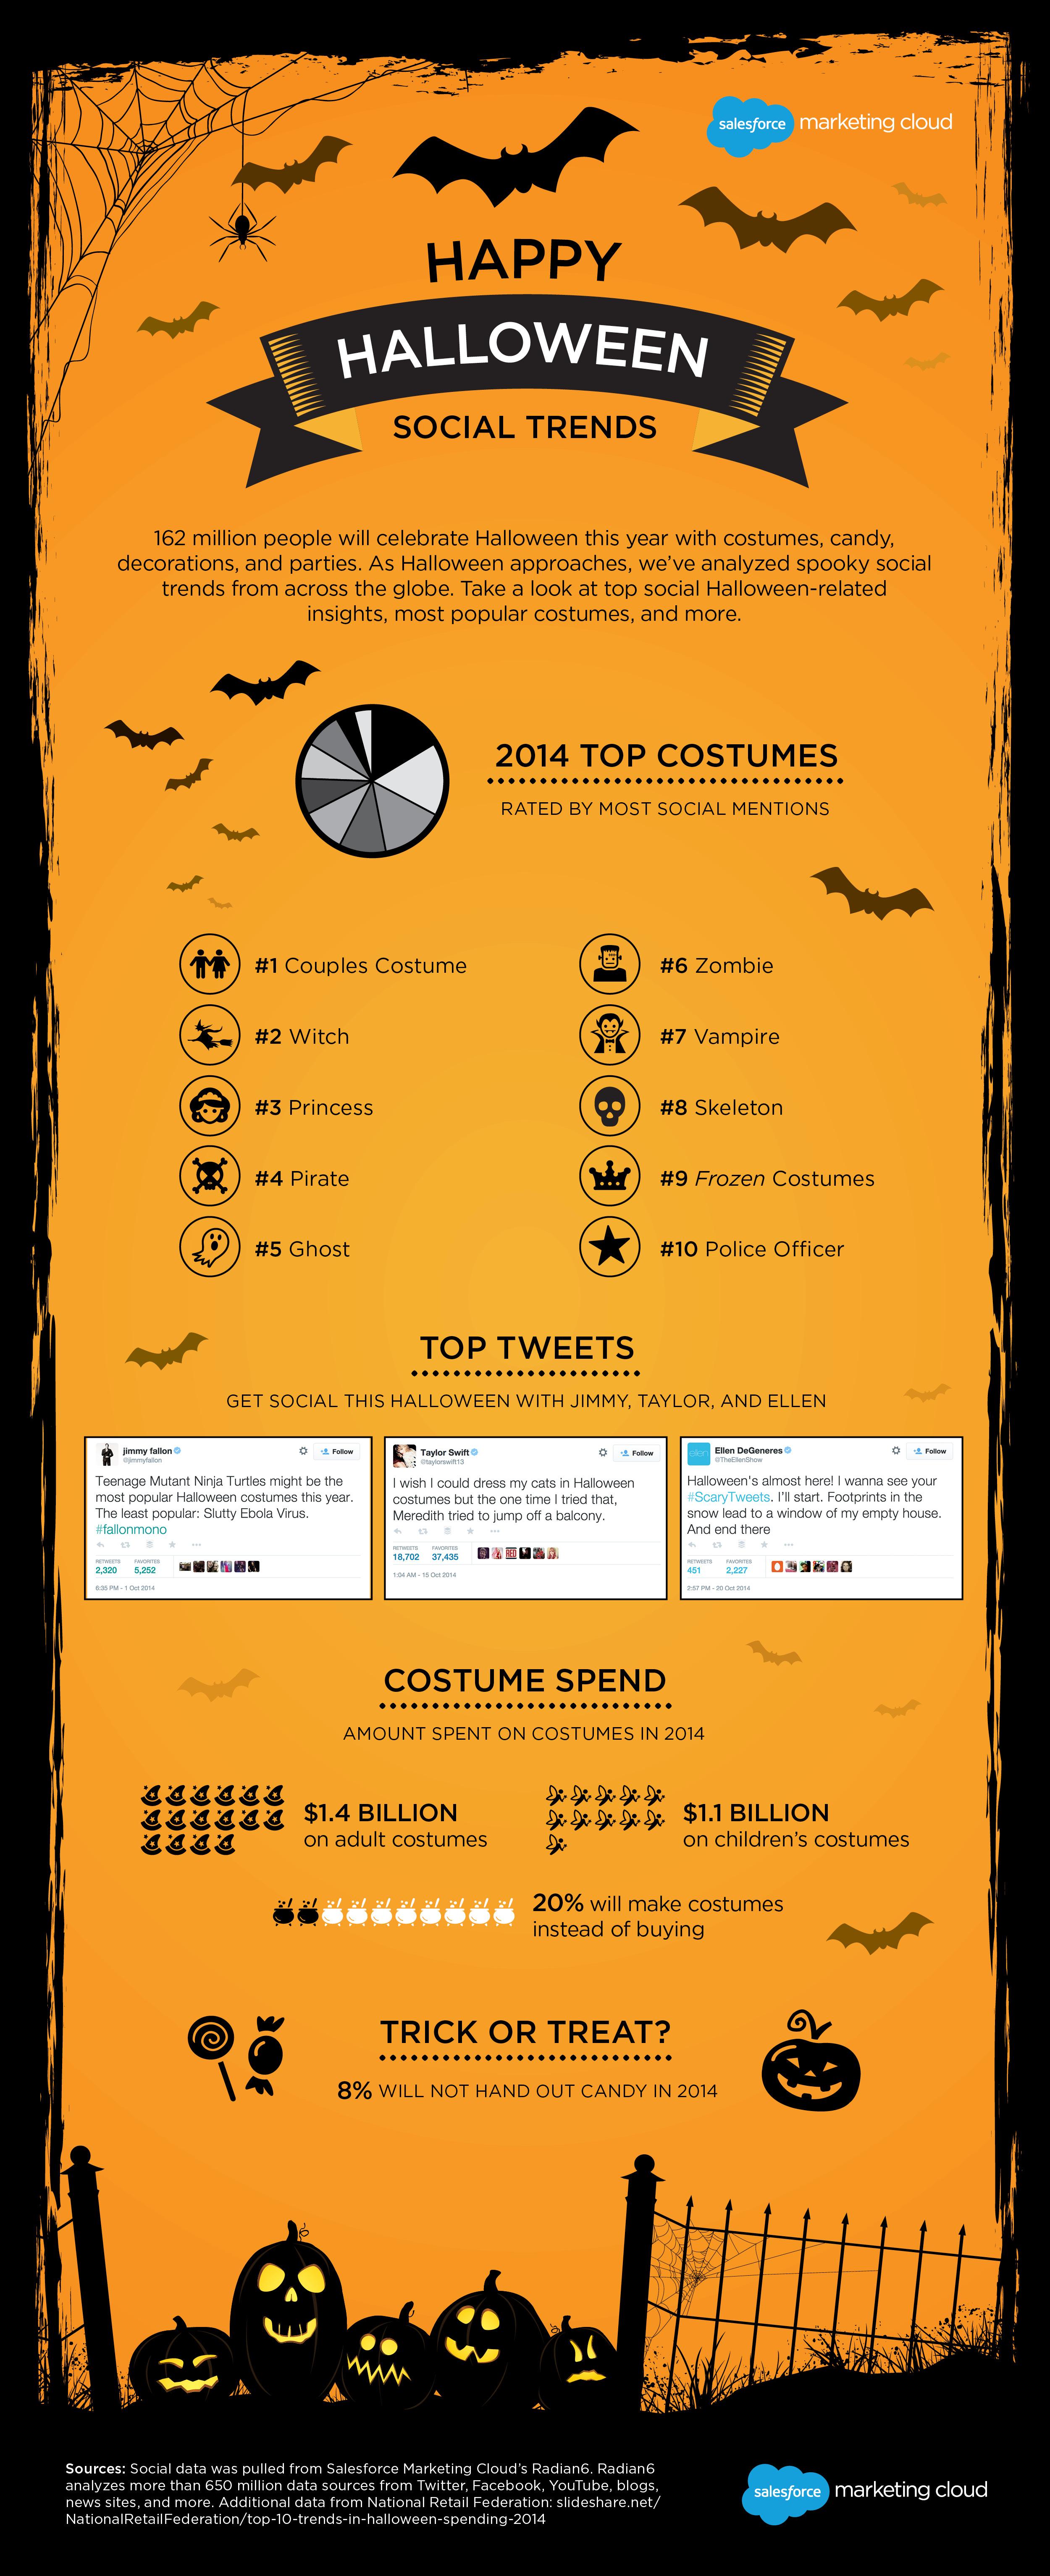 smc-halloweensocialtrends-infographic